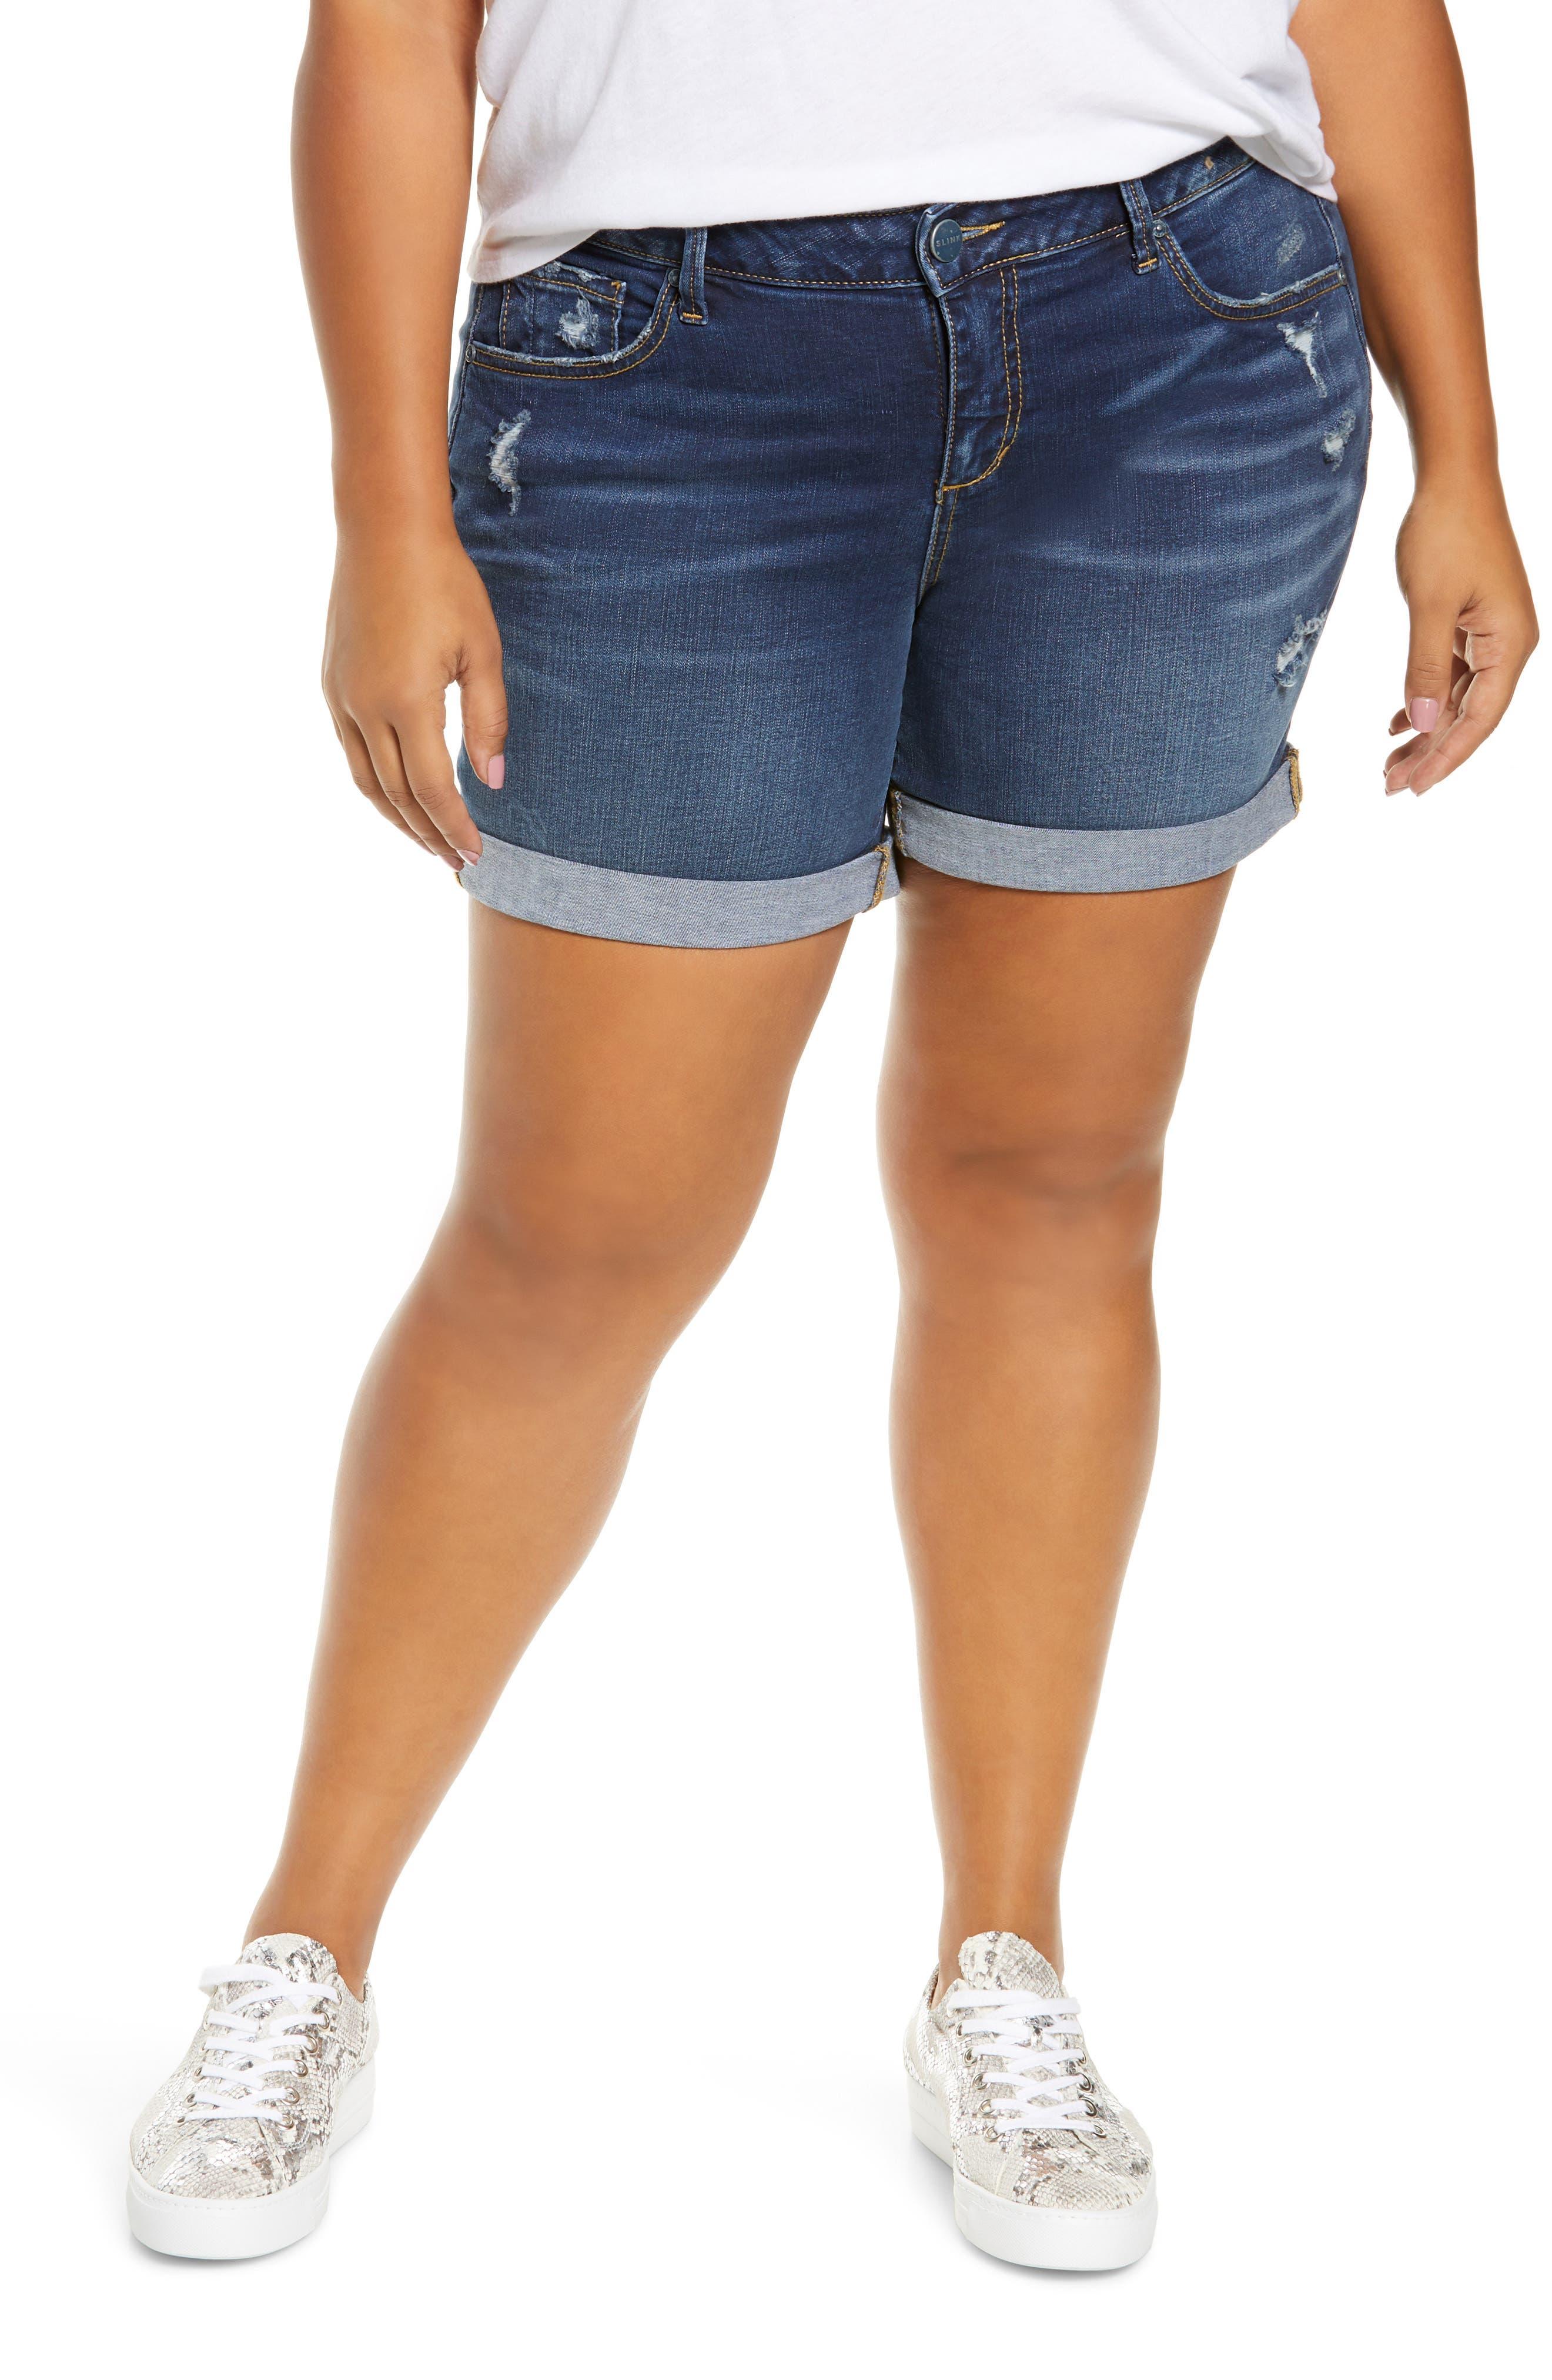 Plus Women's Slink Jeans Roll Cuff Denim Shorts